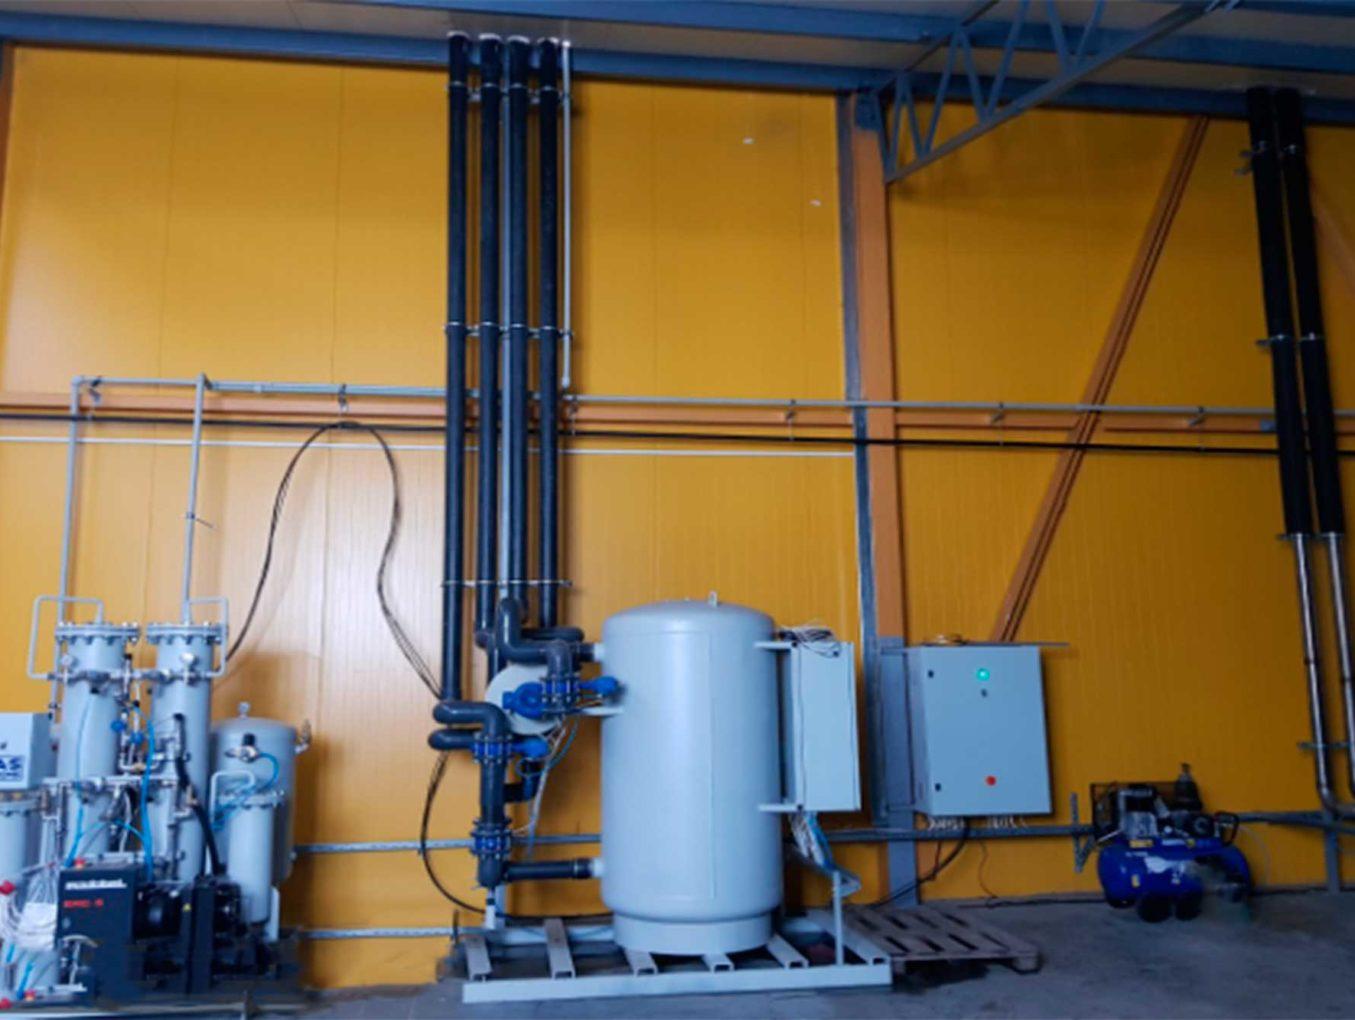 Generator-azota-adsorbcionnogo-tipa